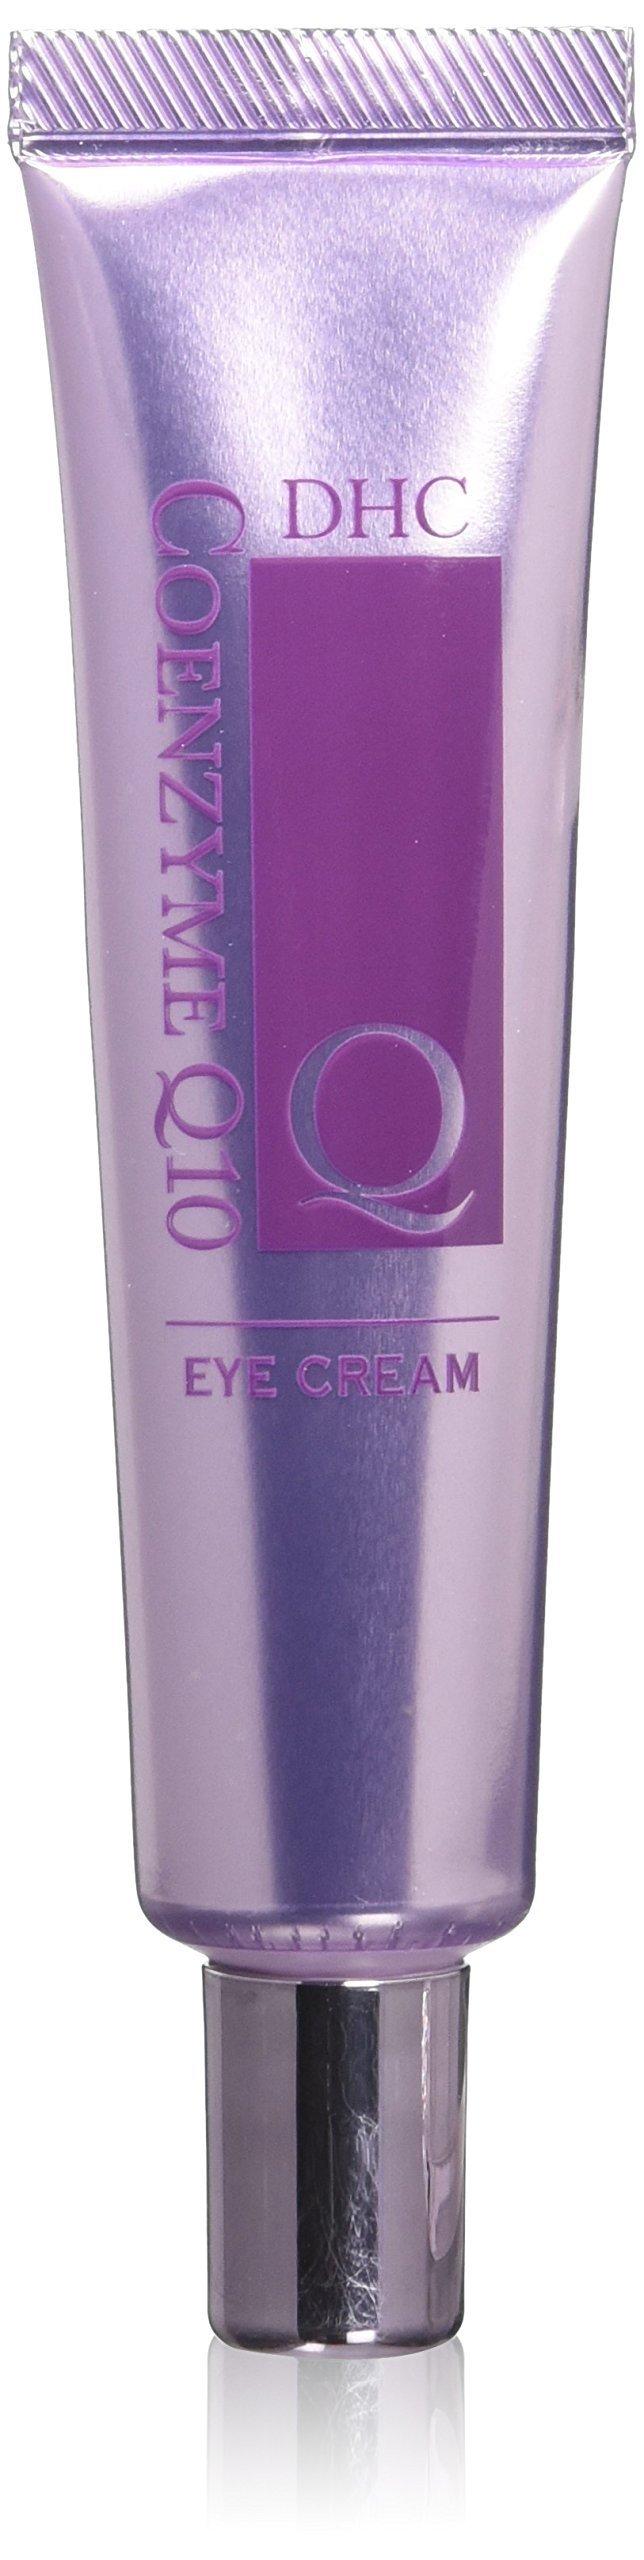 DHC Eye Cream, Firming Moisturizer, 0.88 oz.